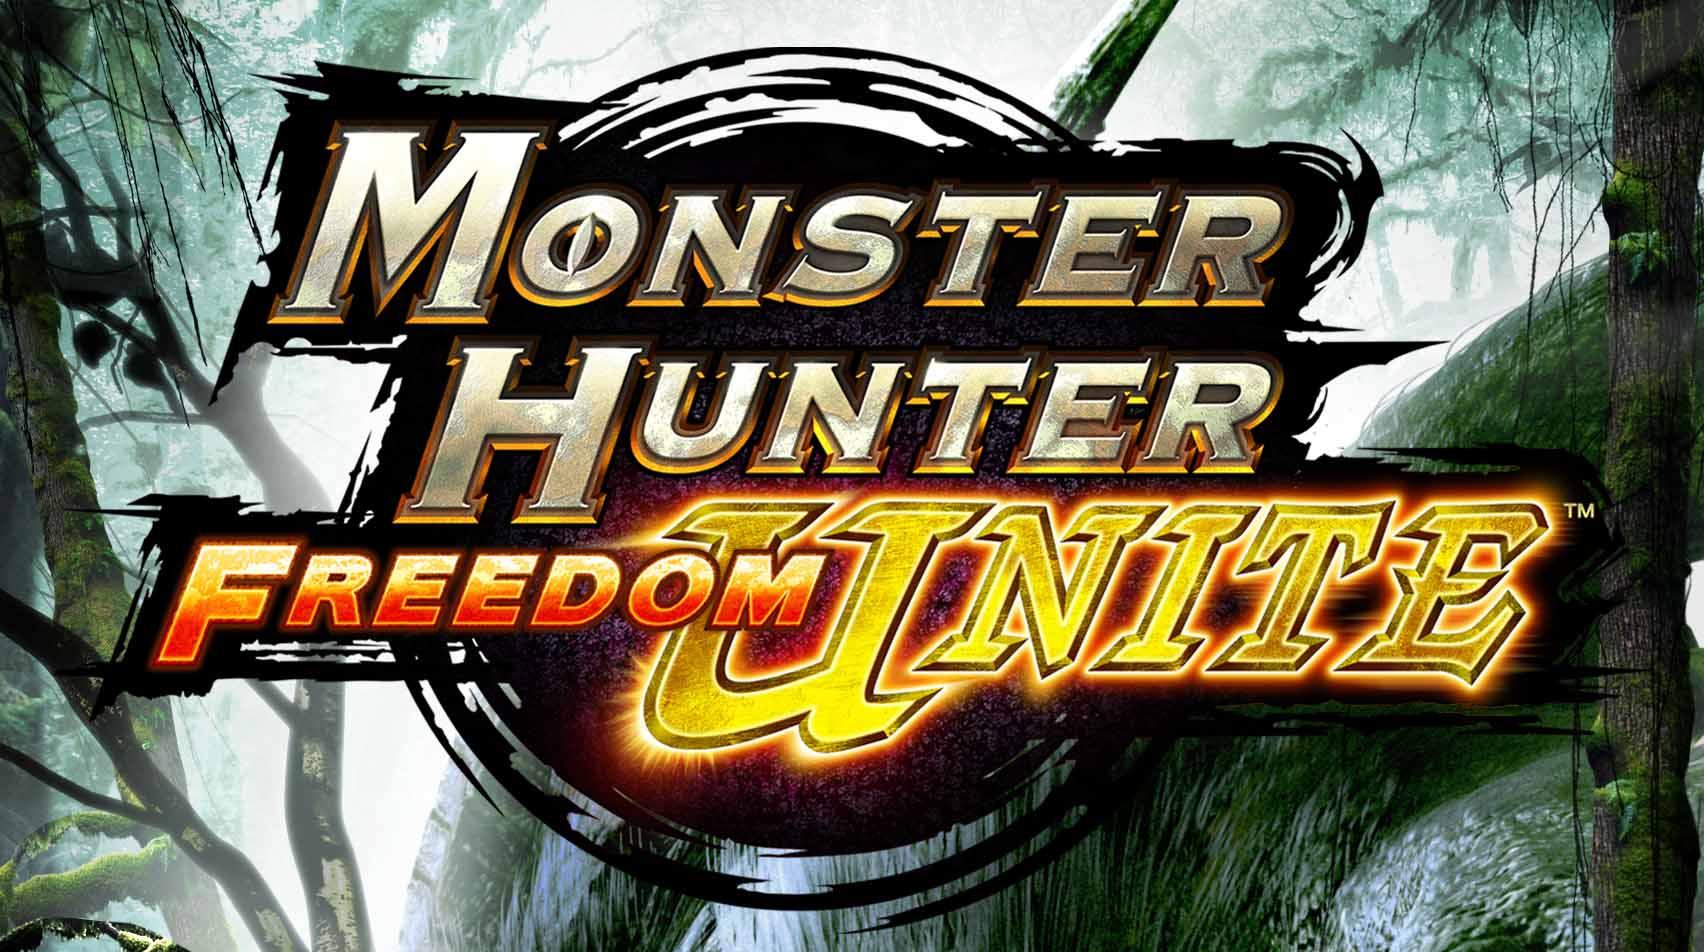 Monster Hunter Freedom Unite suddenly drops onto the App Store